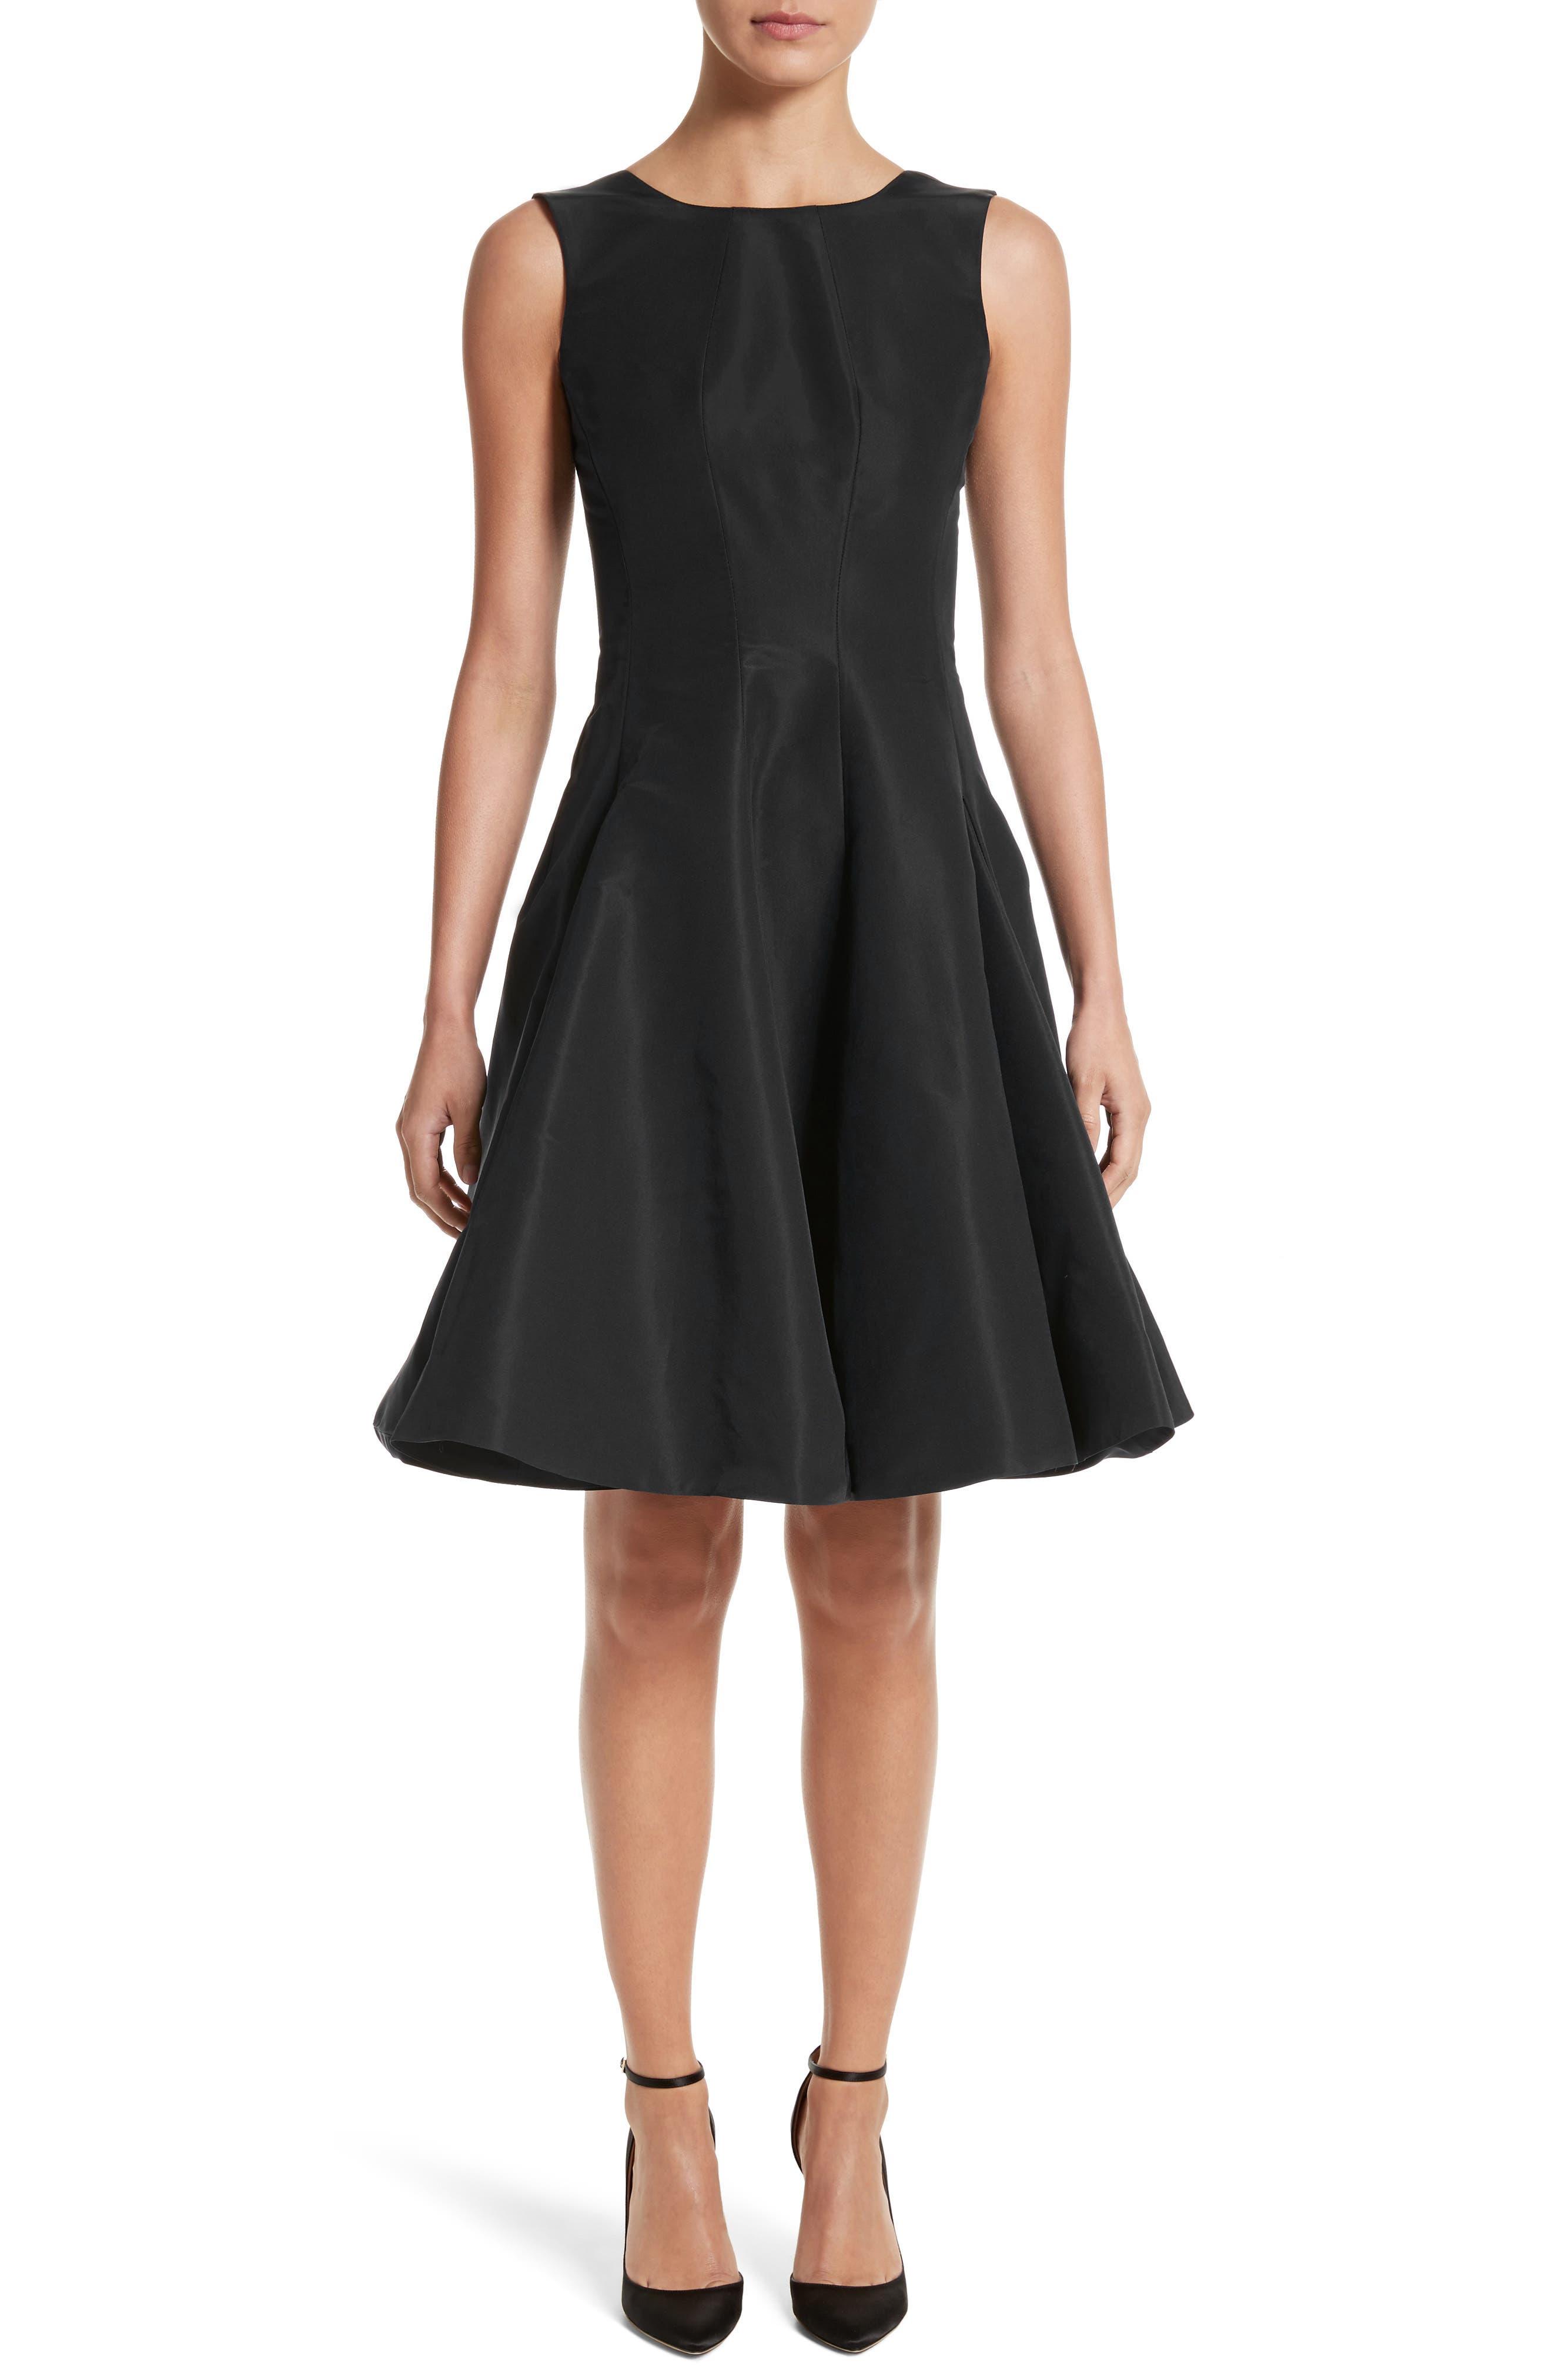 Main Image - Zac Posen Scoop Back Pleat Silk Faille Dress